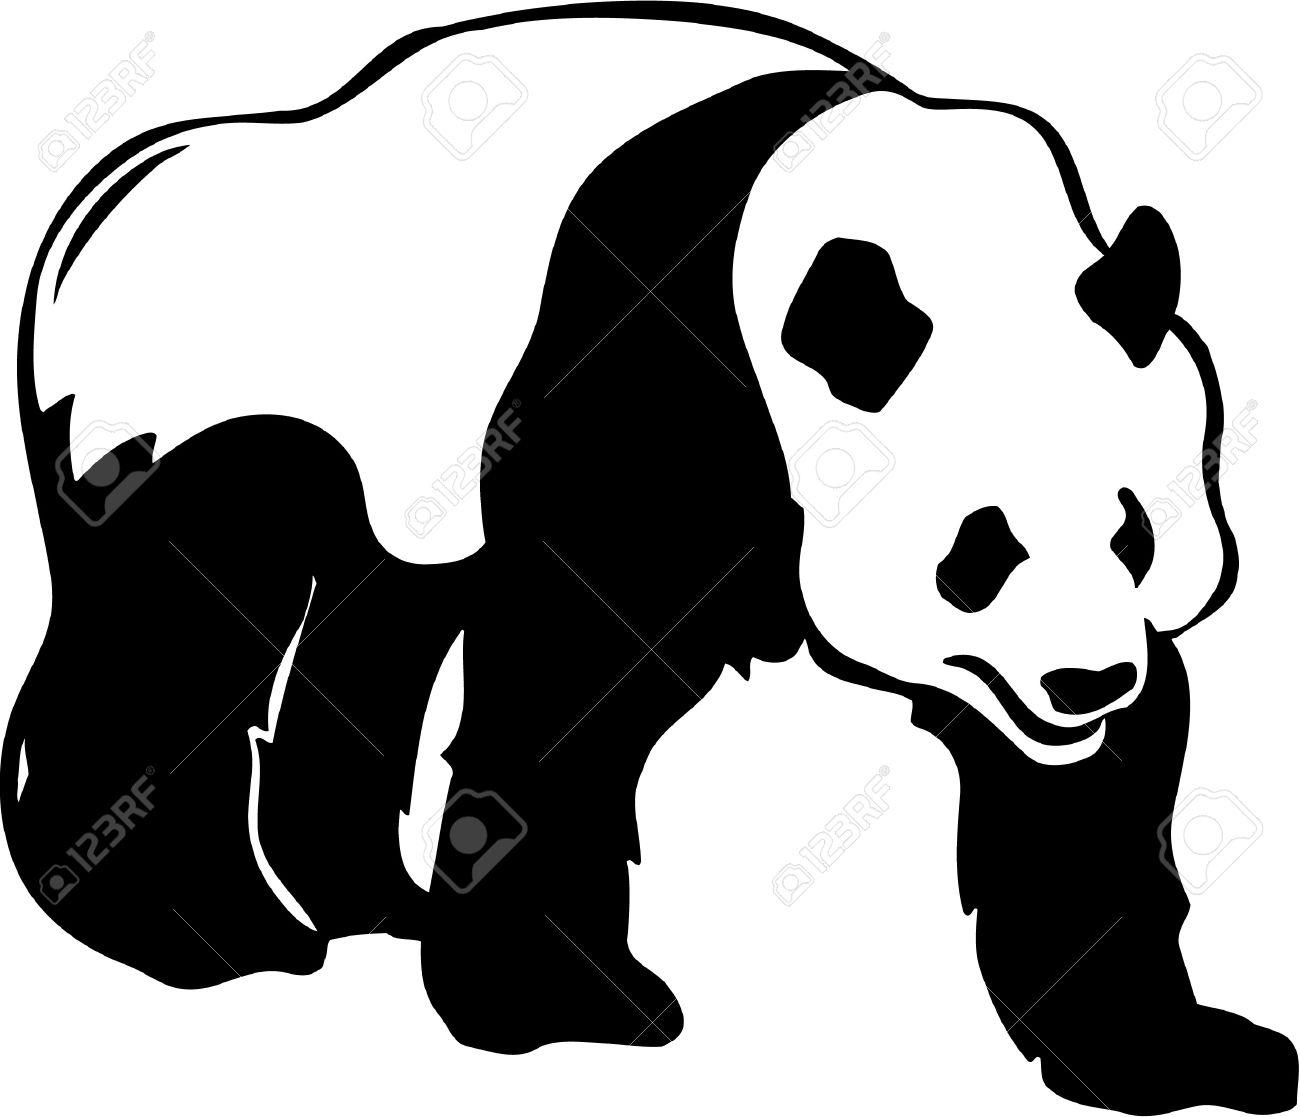 Clipart Panda Free Clipart Images: Giant Panda Clipart